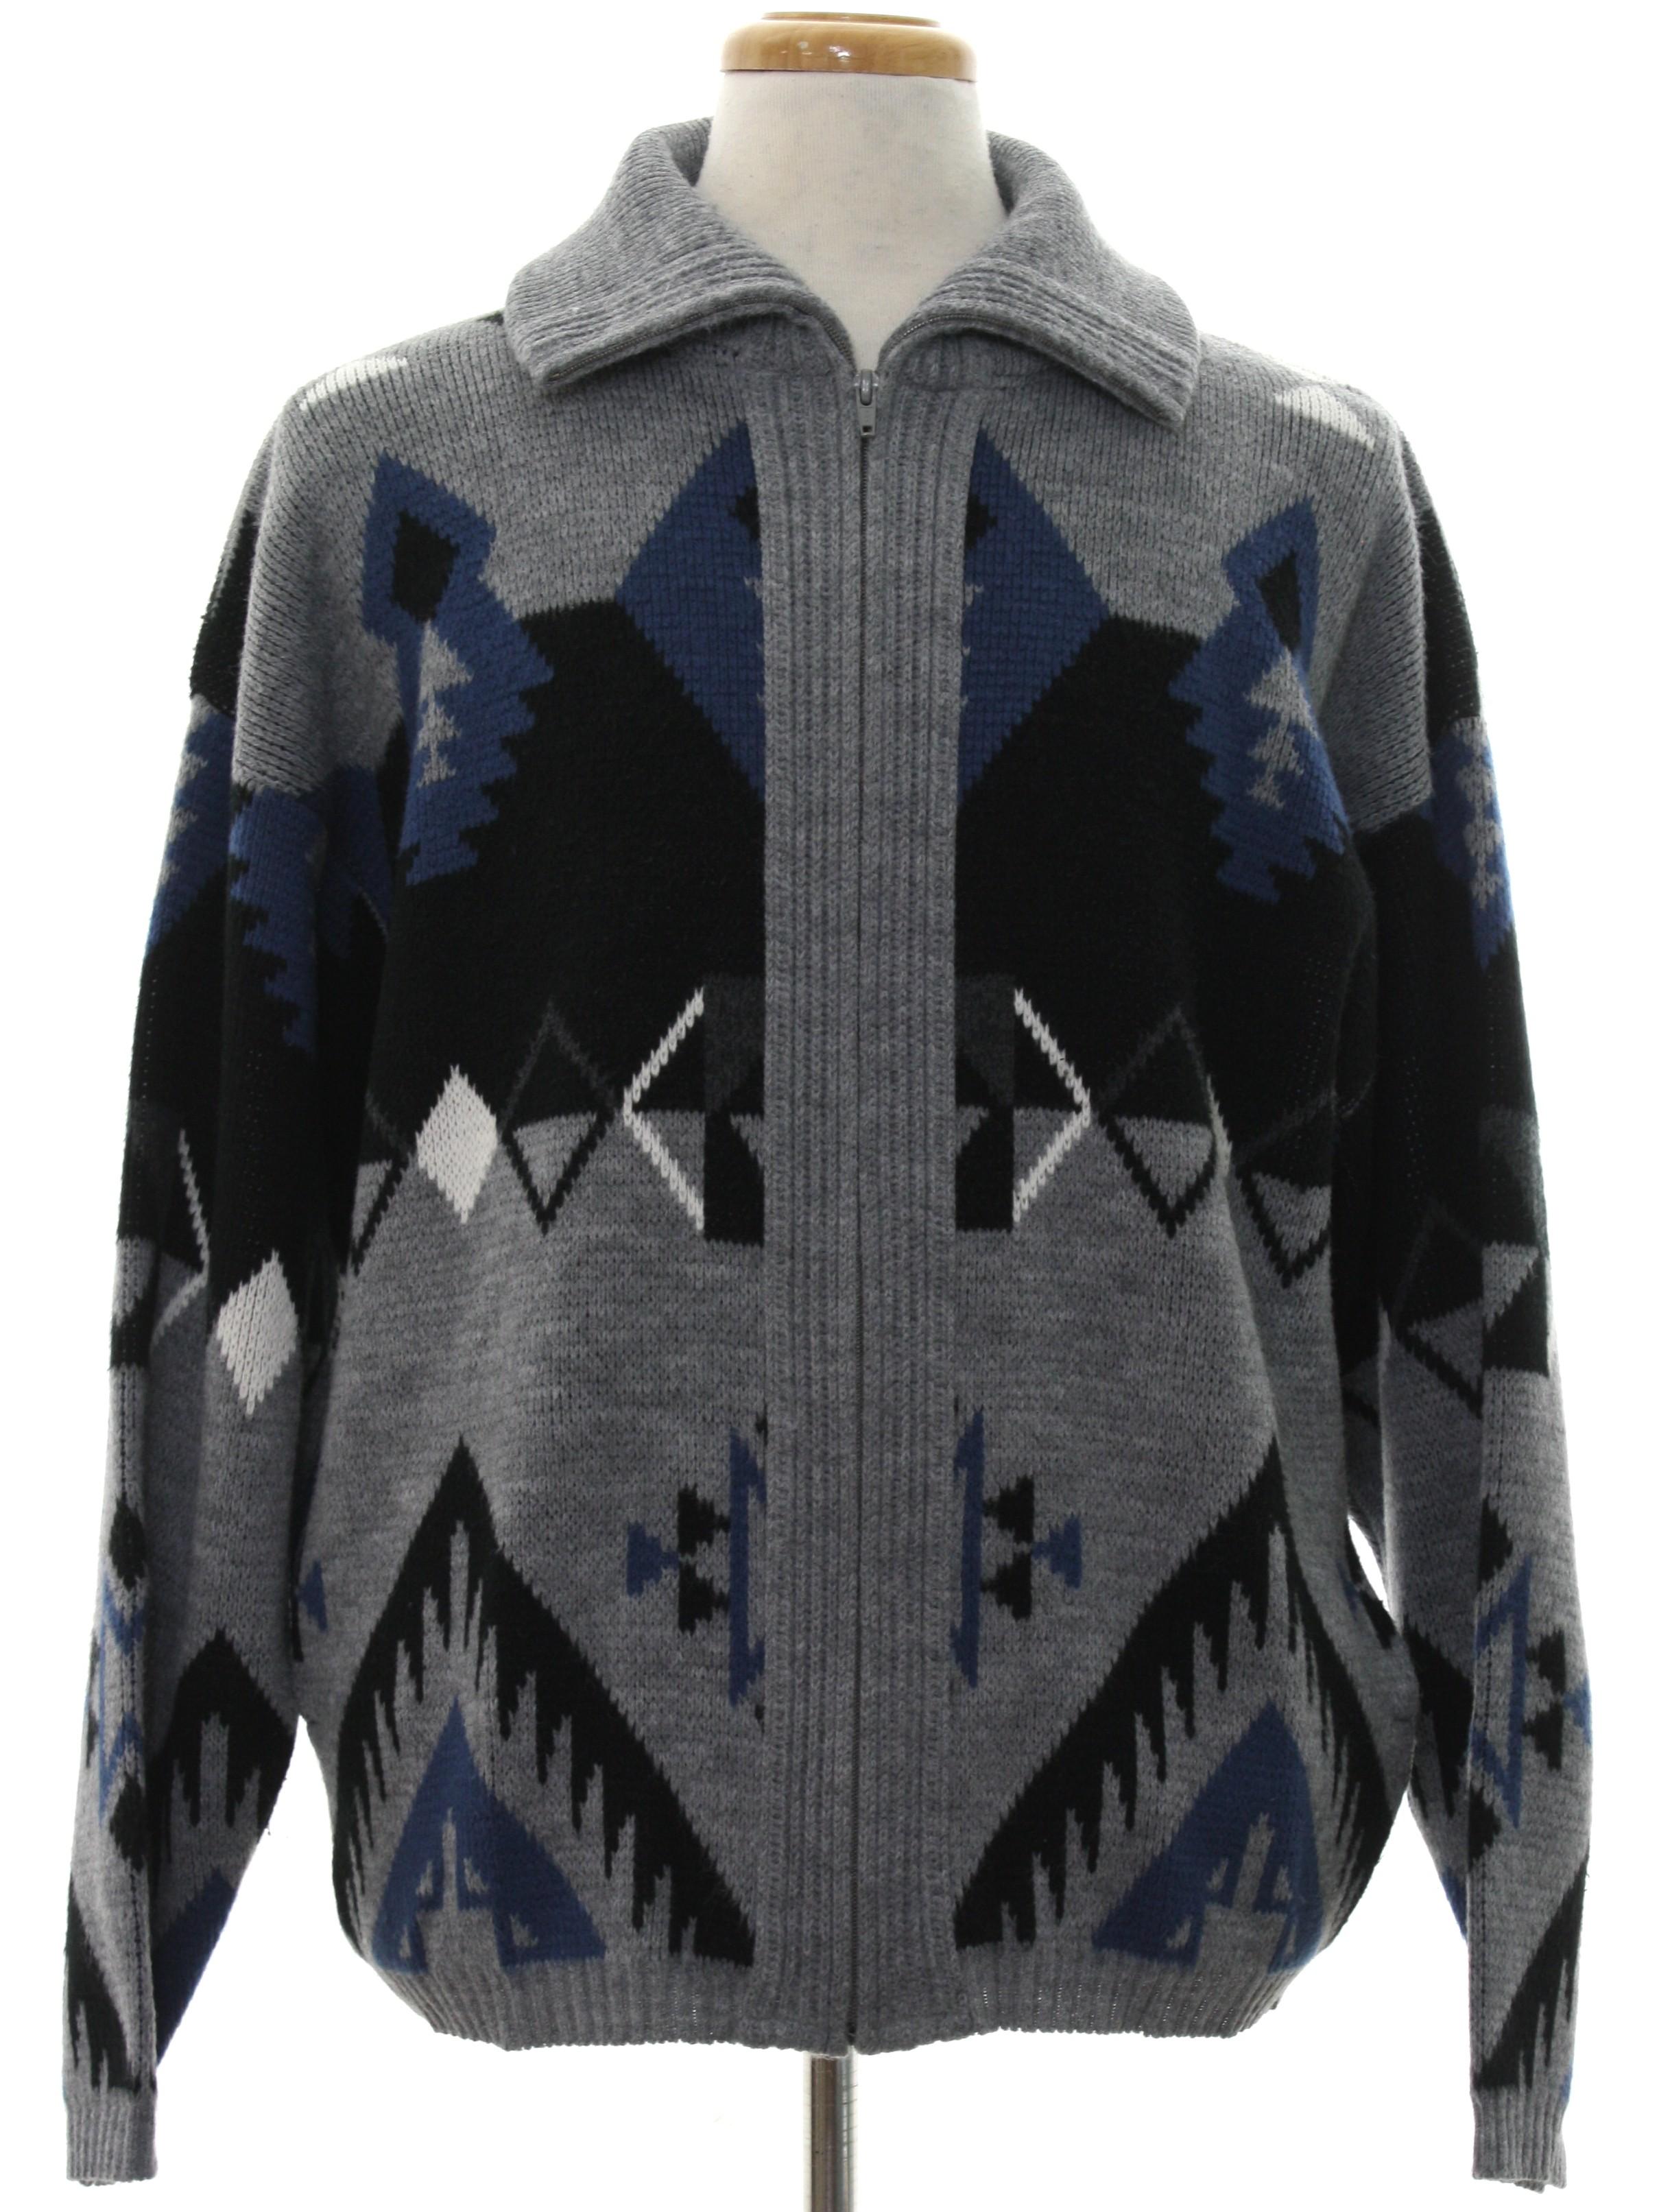 Jcpenney Sweaters Men